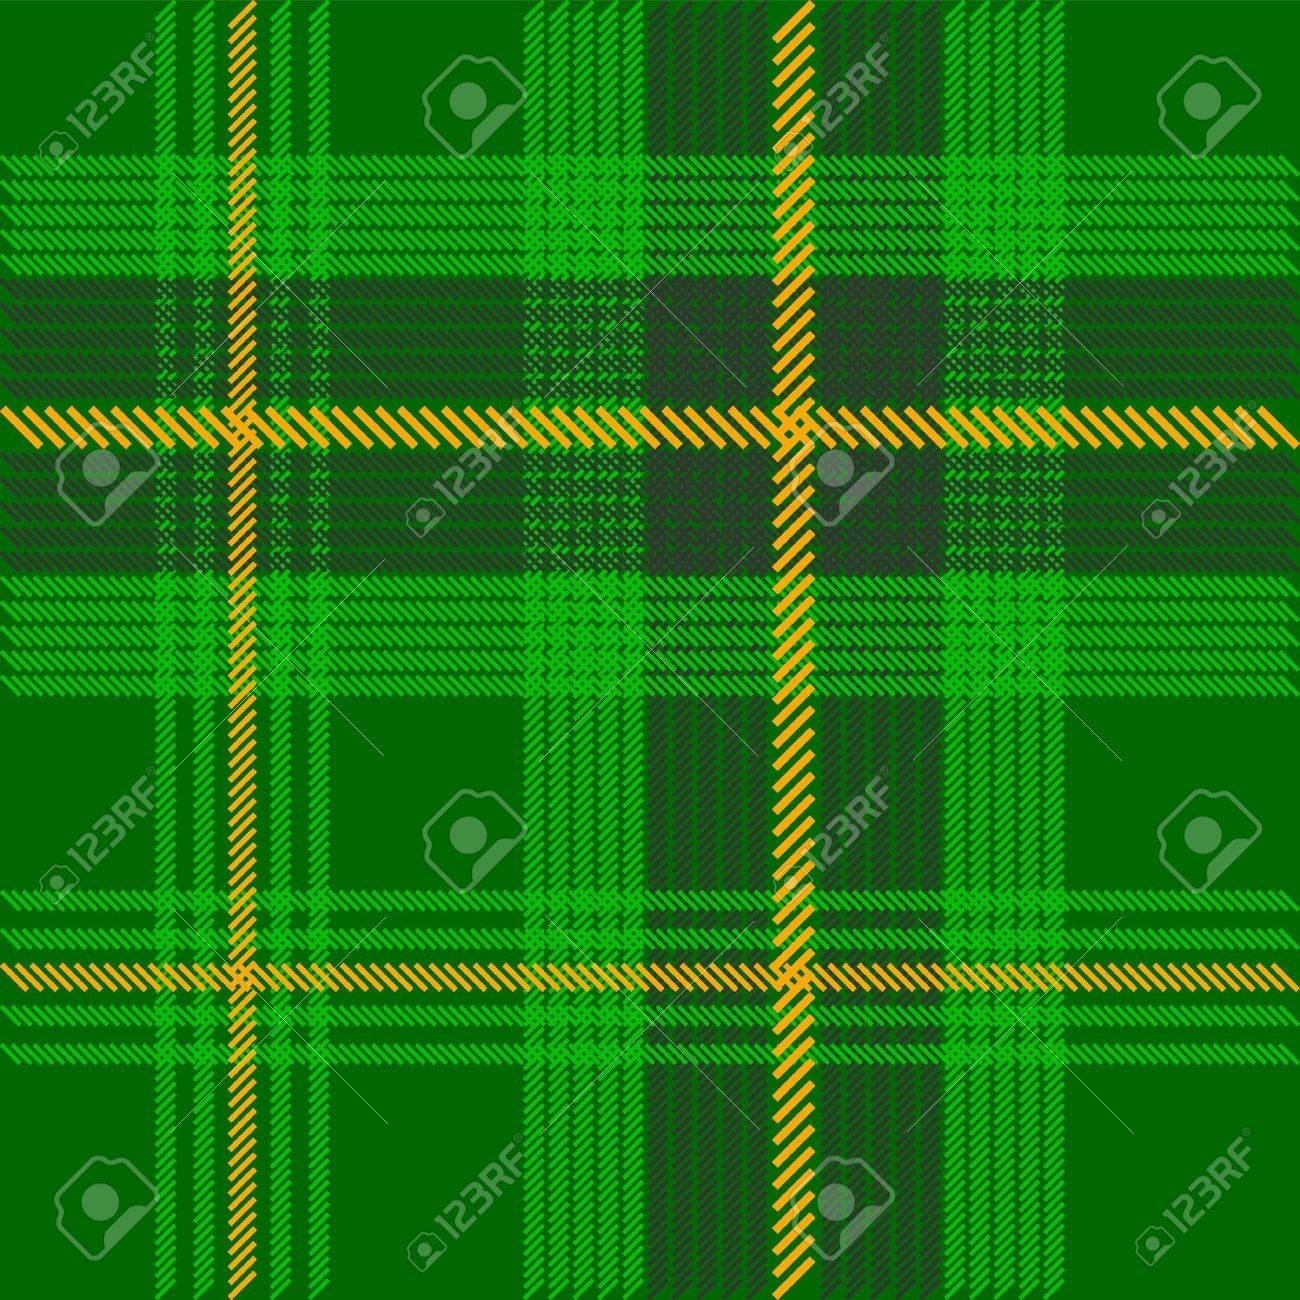 Green Tartan Fabric Texture